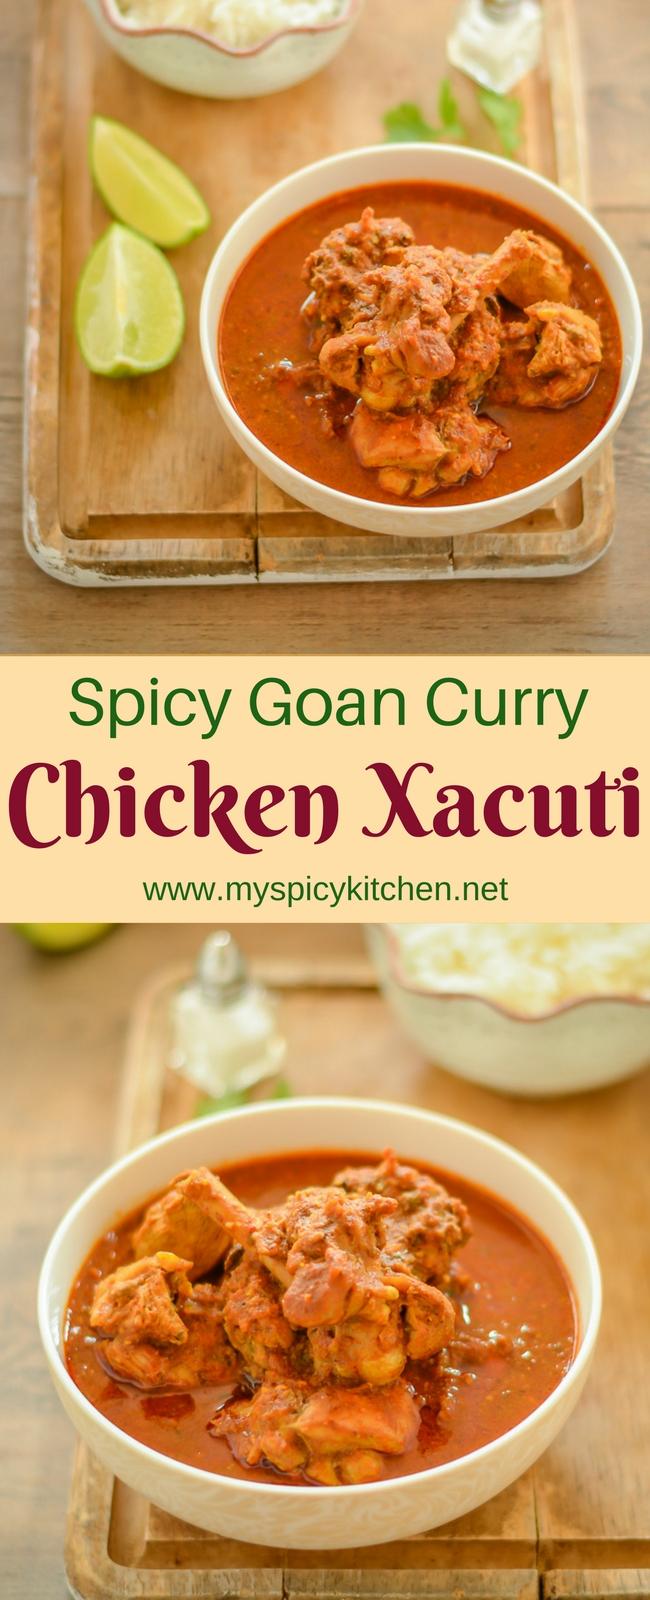 Chicken Xacuti